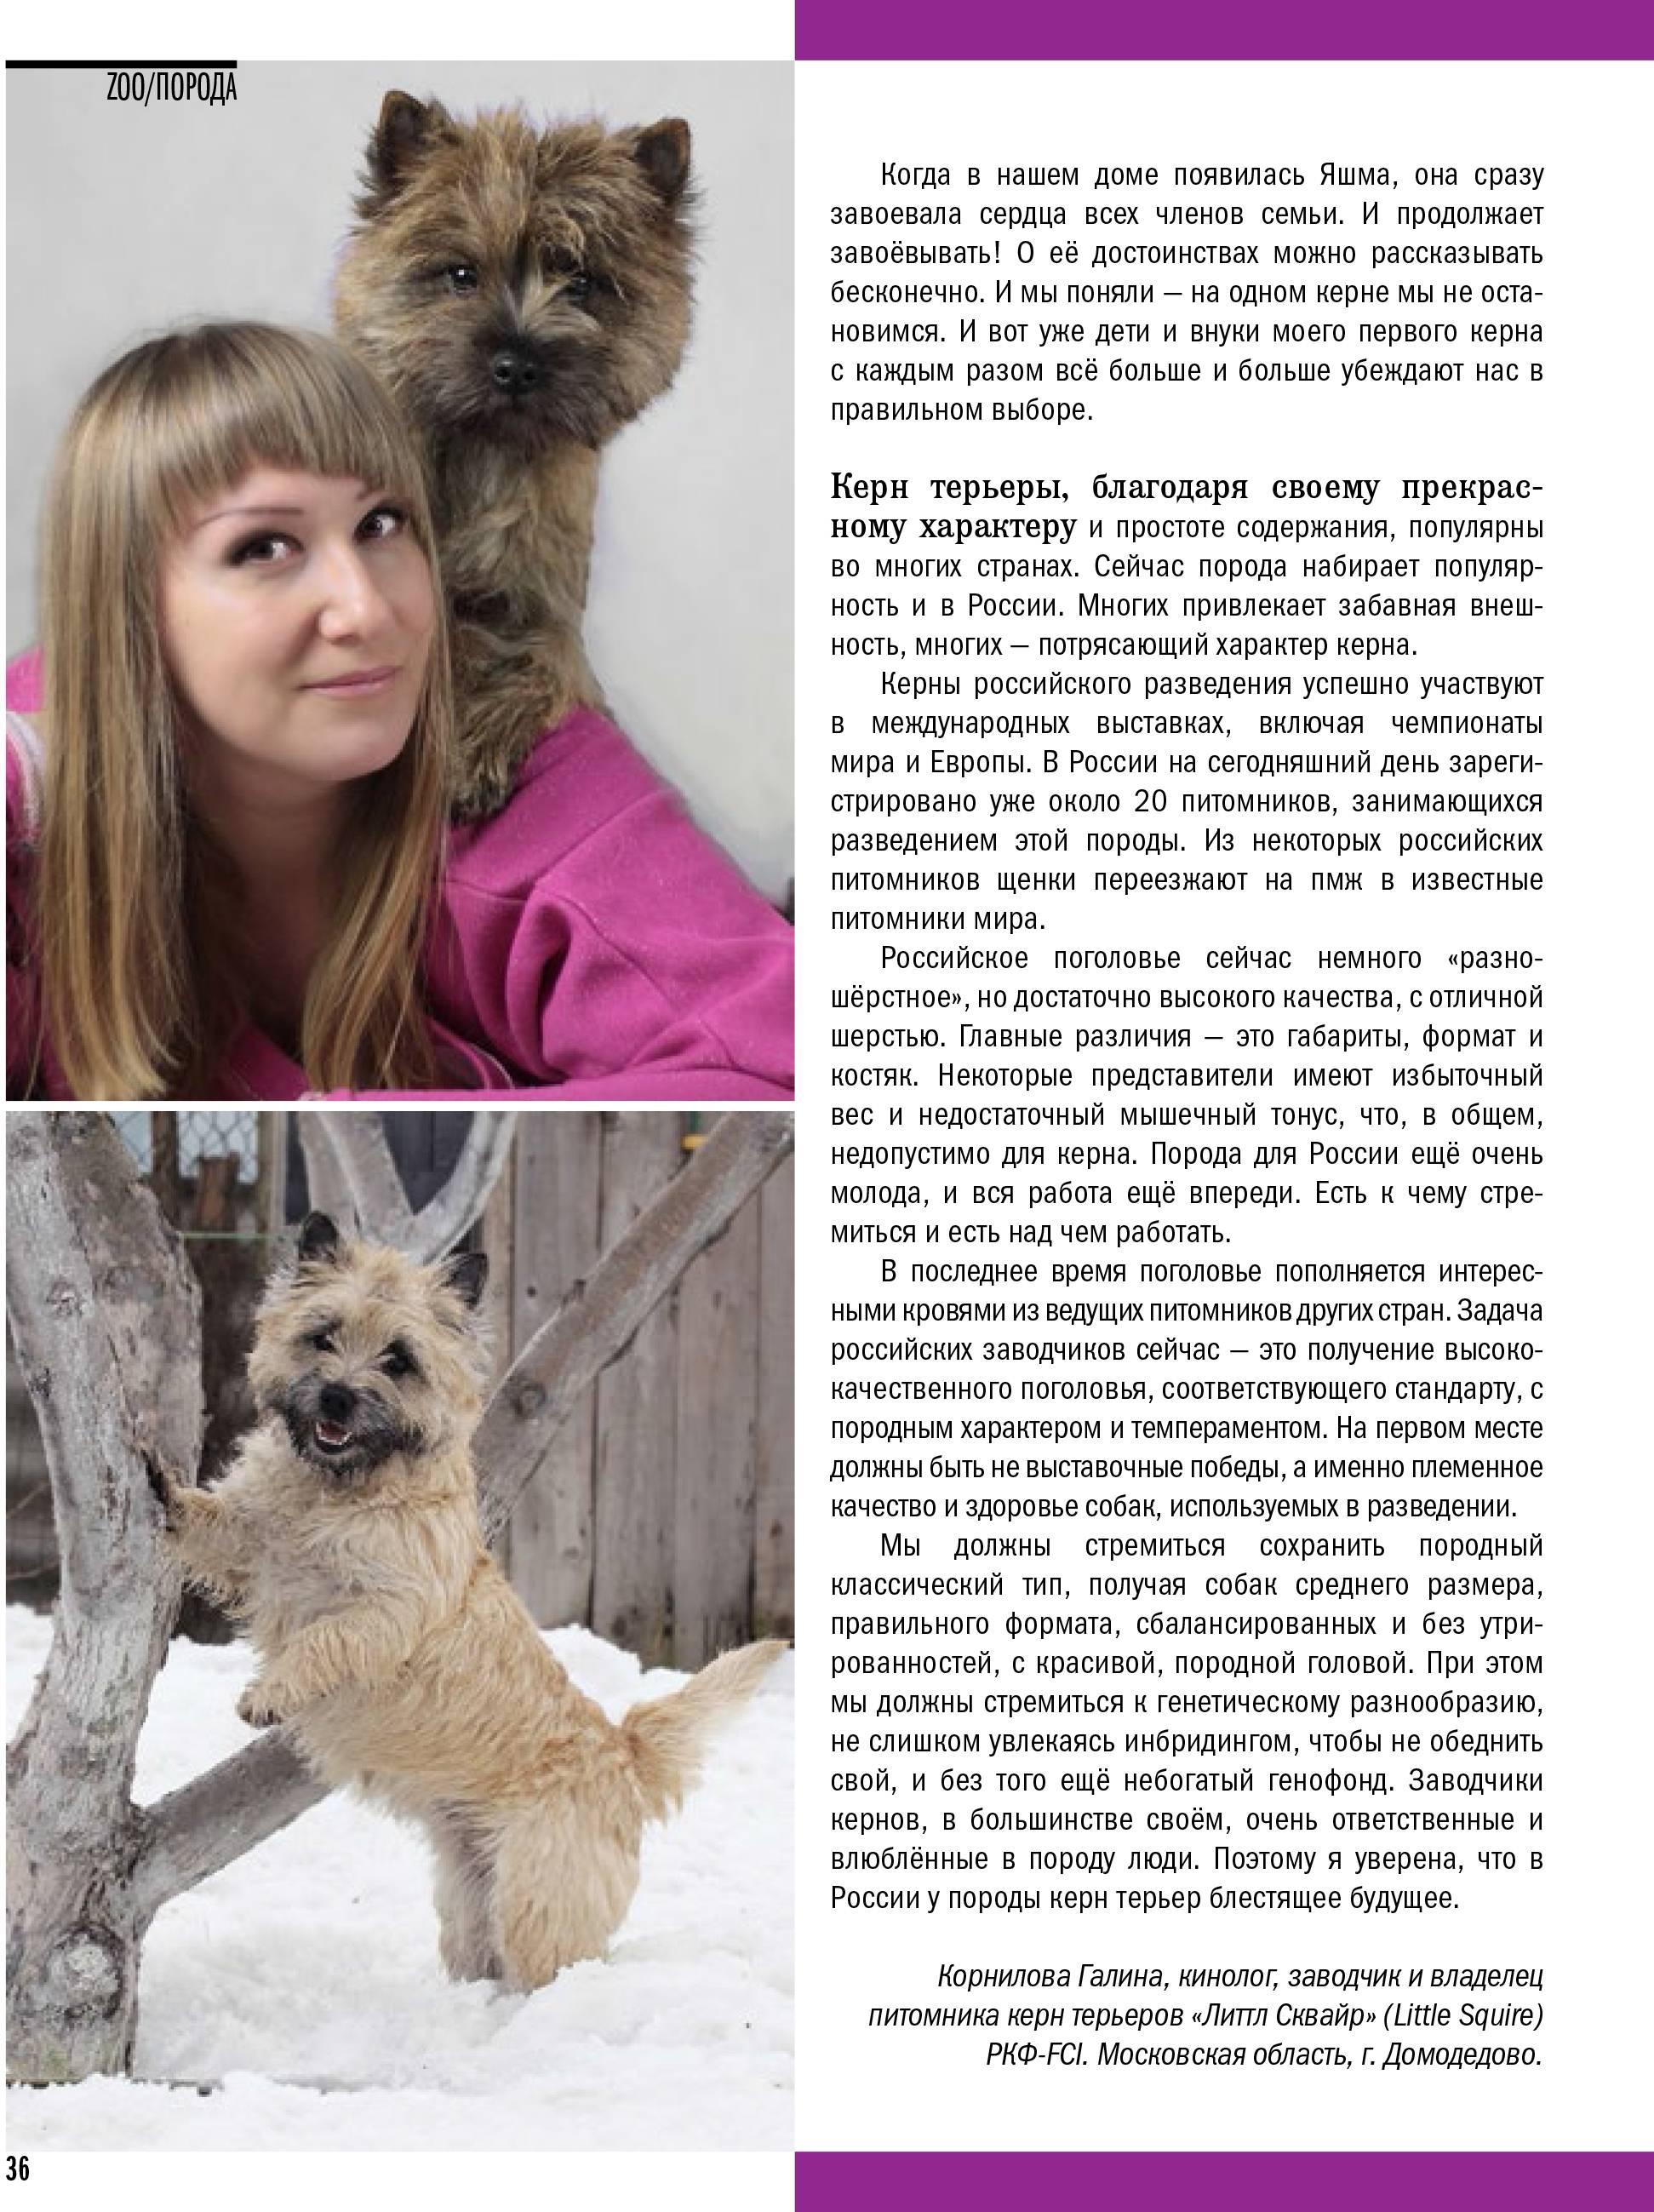 Керн-терьер — описание породы и характер собаки